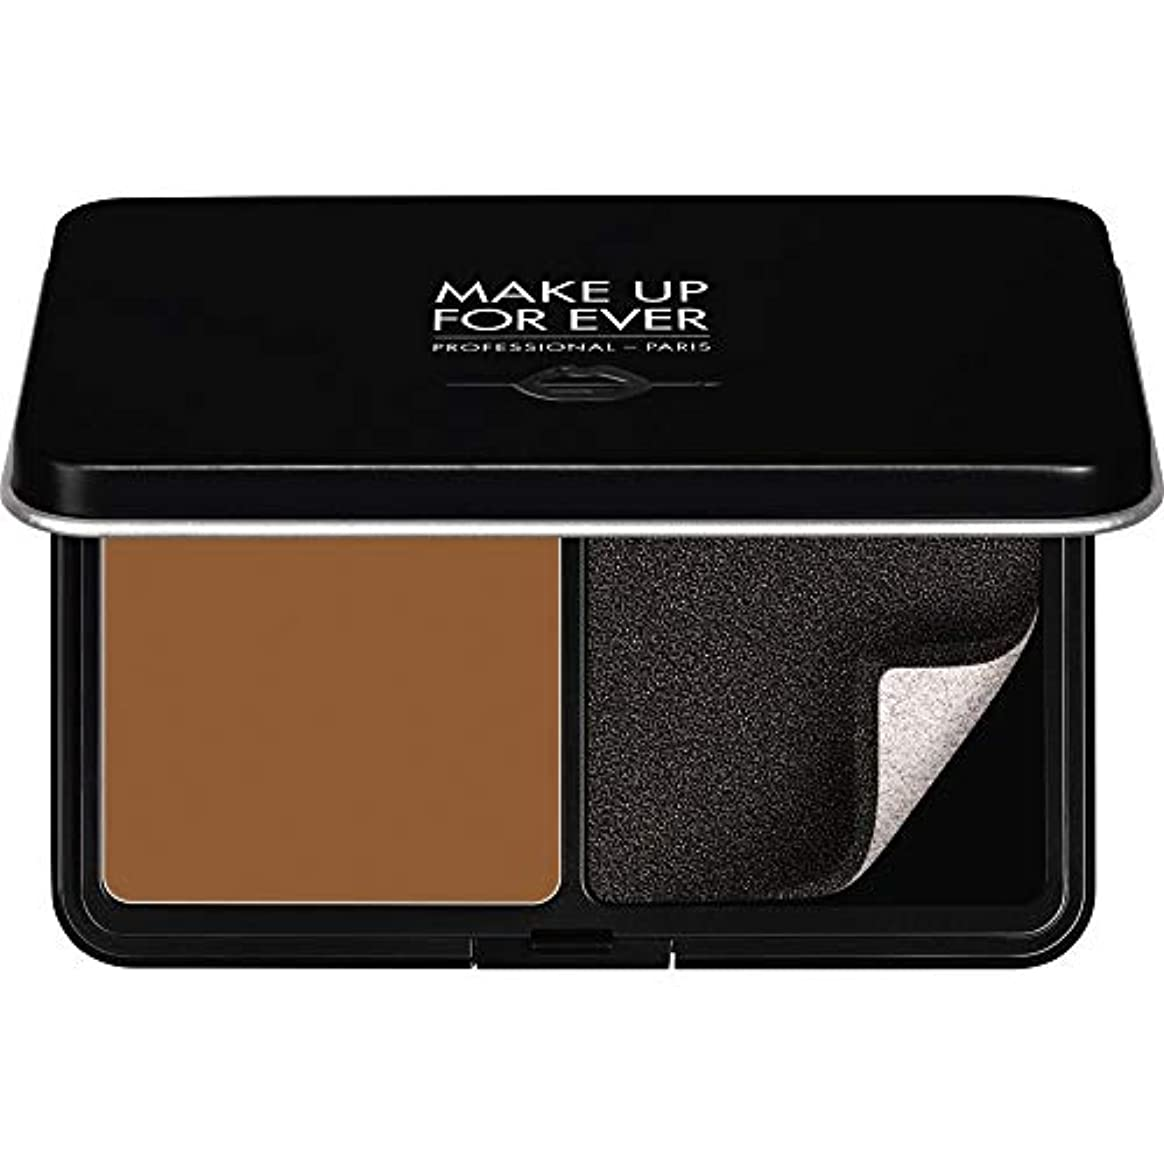 [MAKE UP FOR EVER] パウダーファンデーション11GののR520をぼかし、これまでマットベルベットの肌を補う - シナモン - MAKE UP FOR EVER Matte Velvet Skin Blurring...